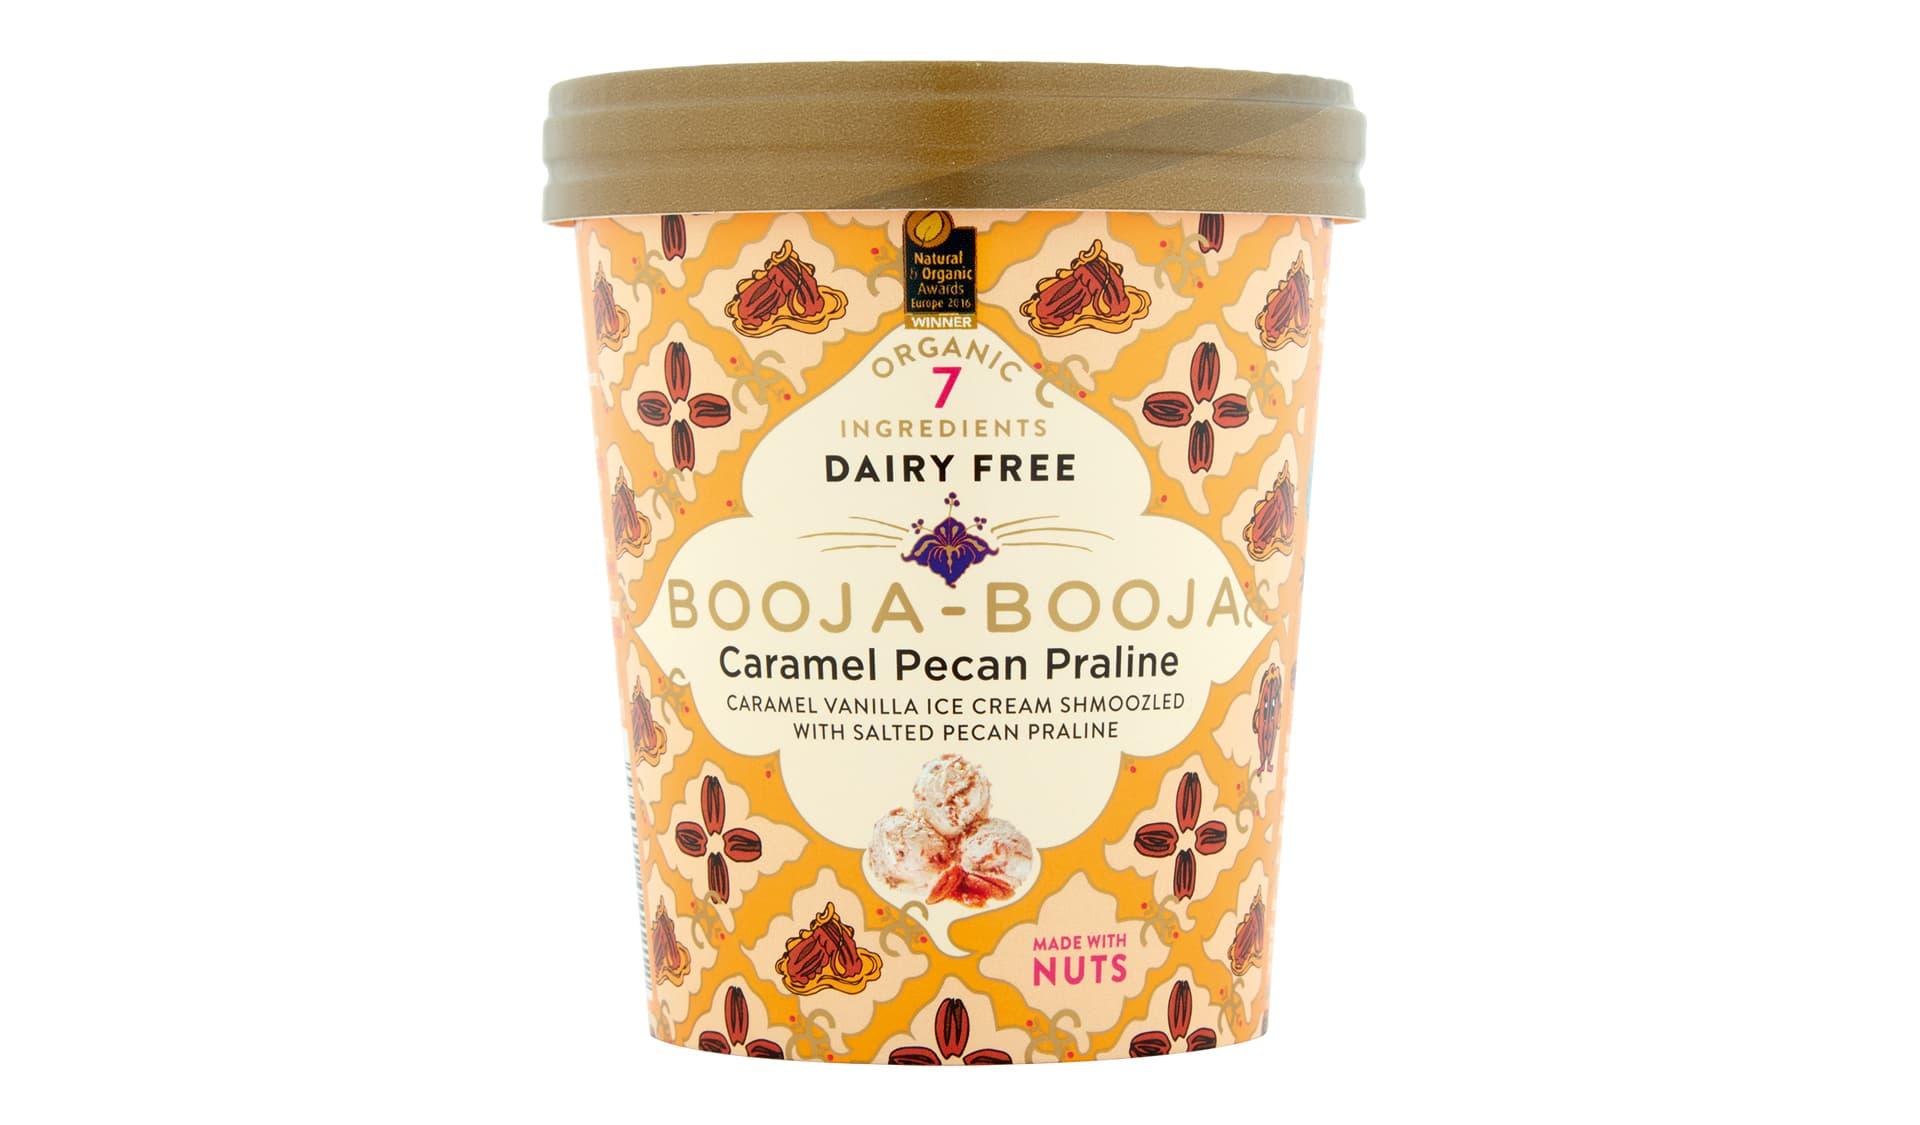 Booja-Booja Caramel Pecan Praline (www.boojabooja.de)